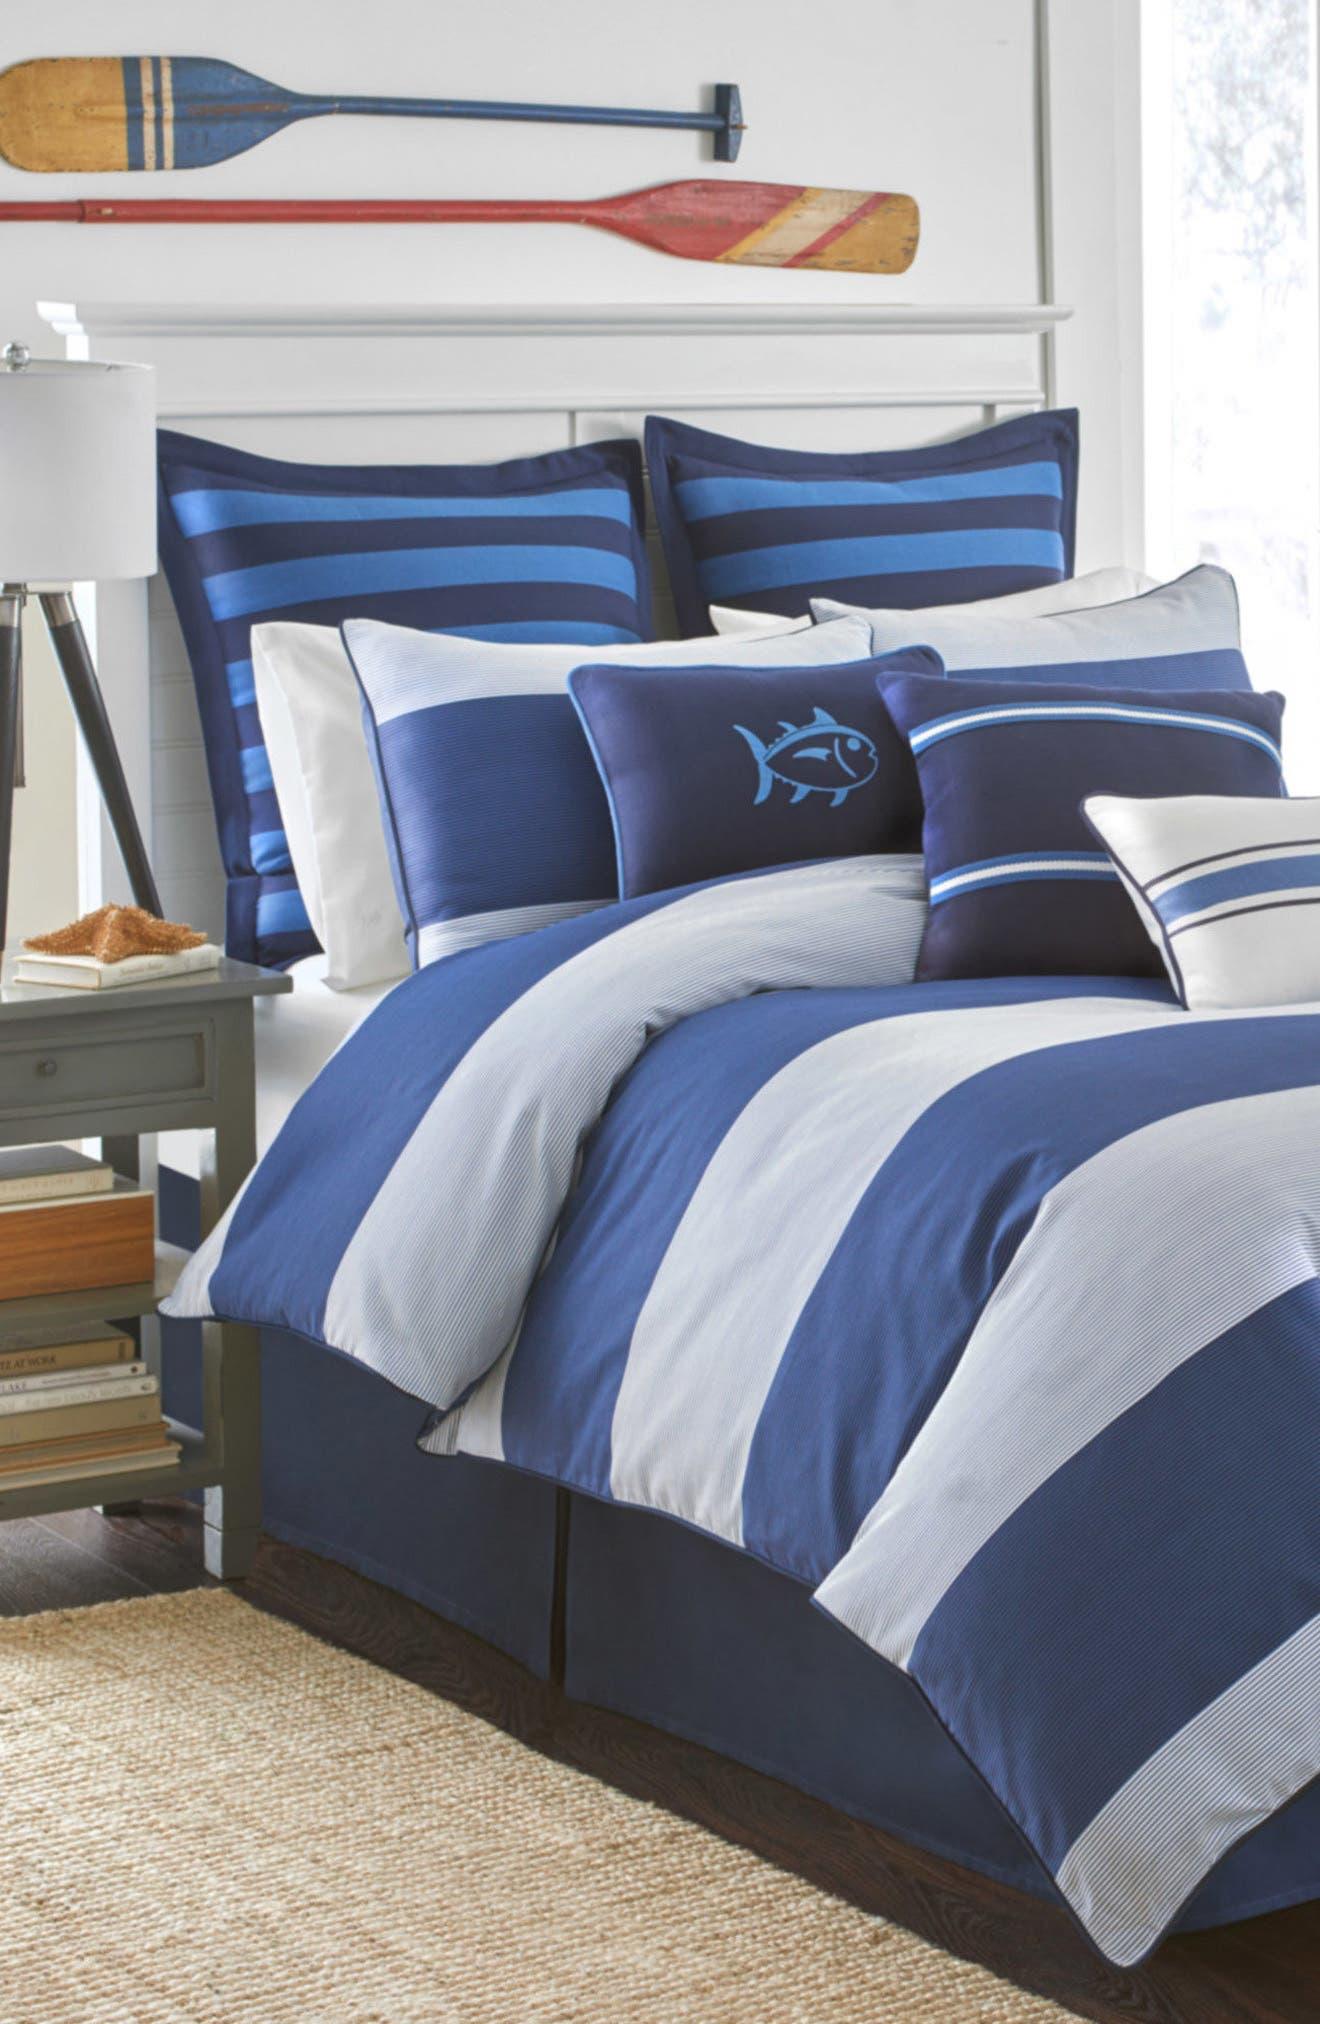 Dock Street Comforter, Sham & Bed Skirt Set,                         Main,                         color, Blue Stream